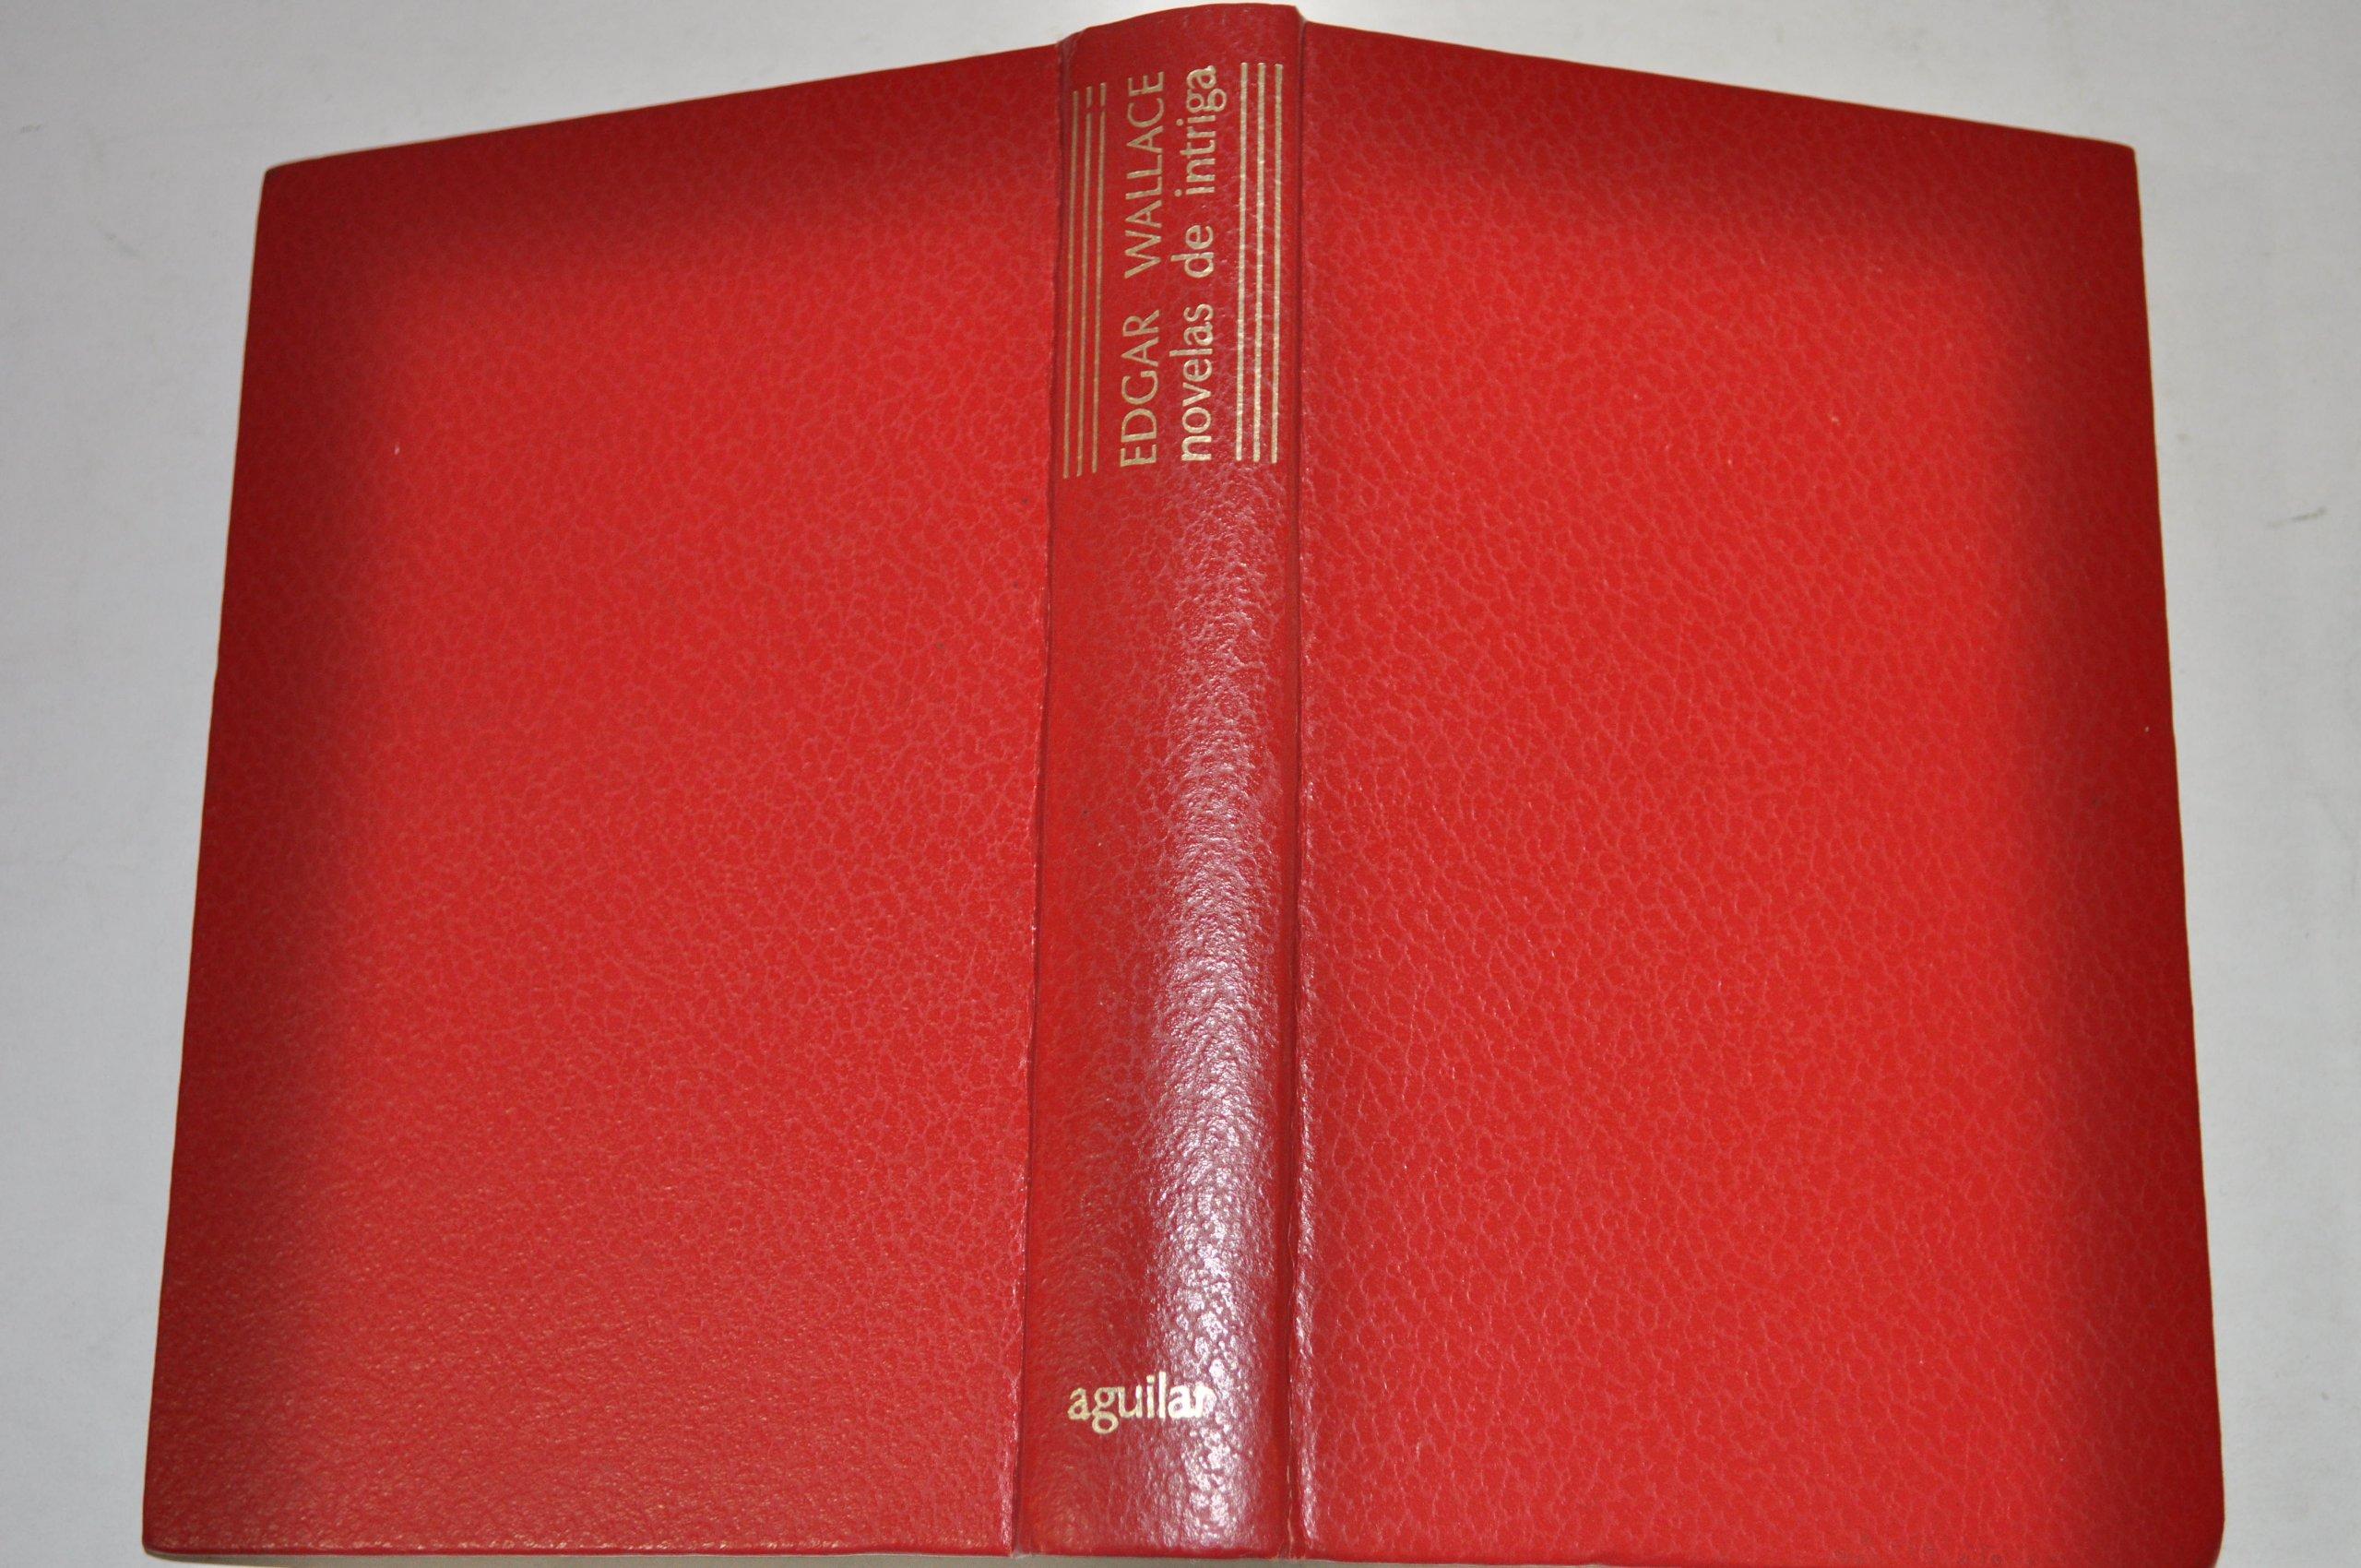 Novelas de misterio la puerta de las siete cerraduras: Edgar Wallace: 9788403681439: Amazon.com: Books